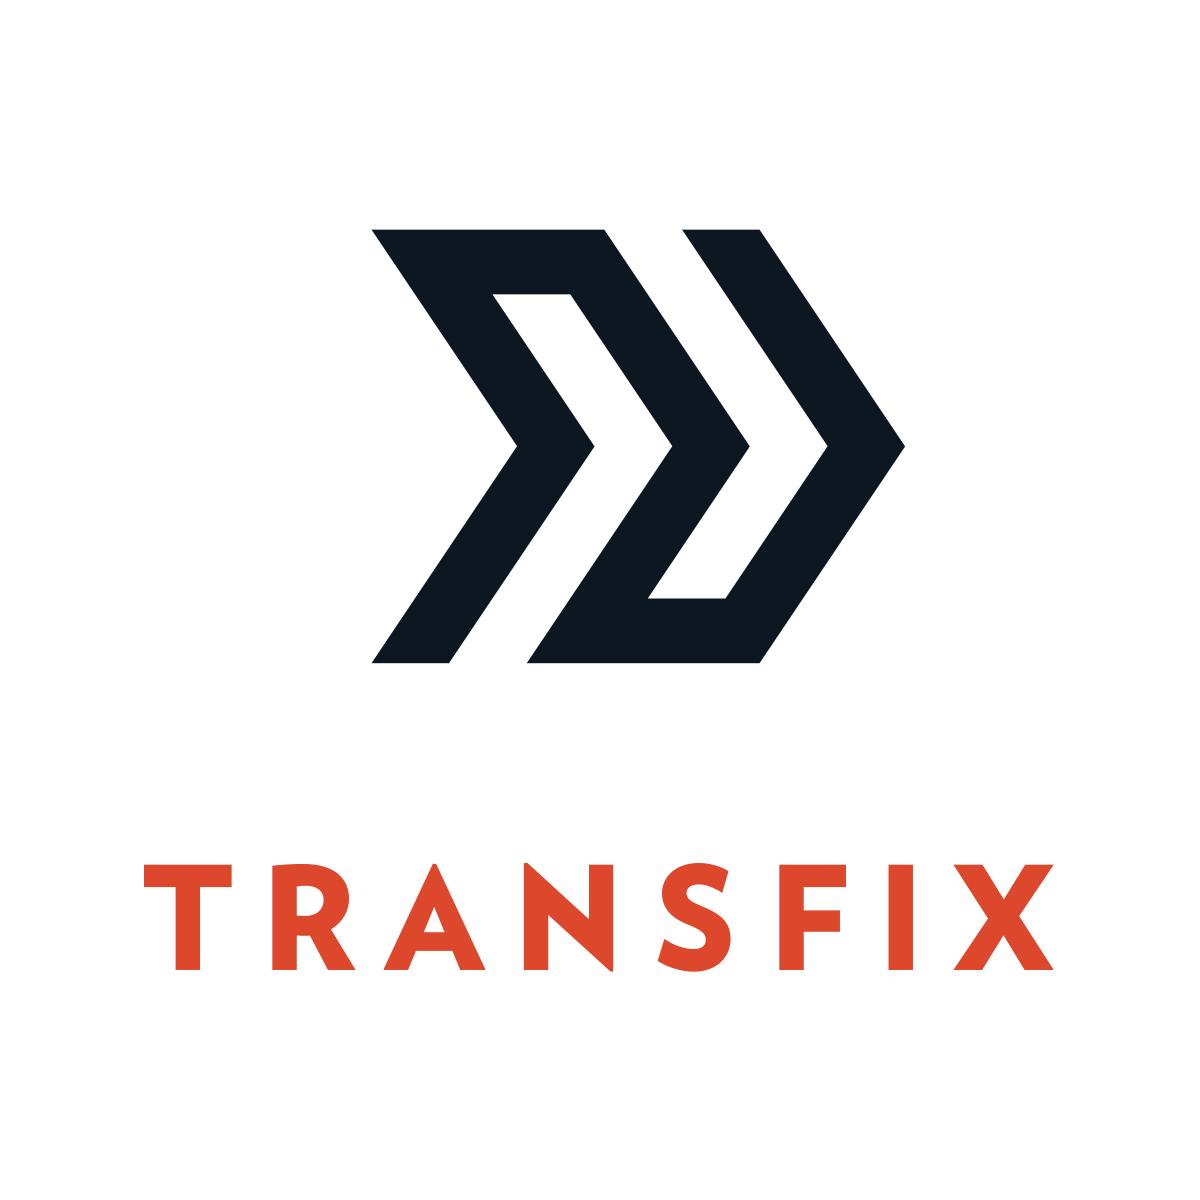 Transfix logo